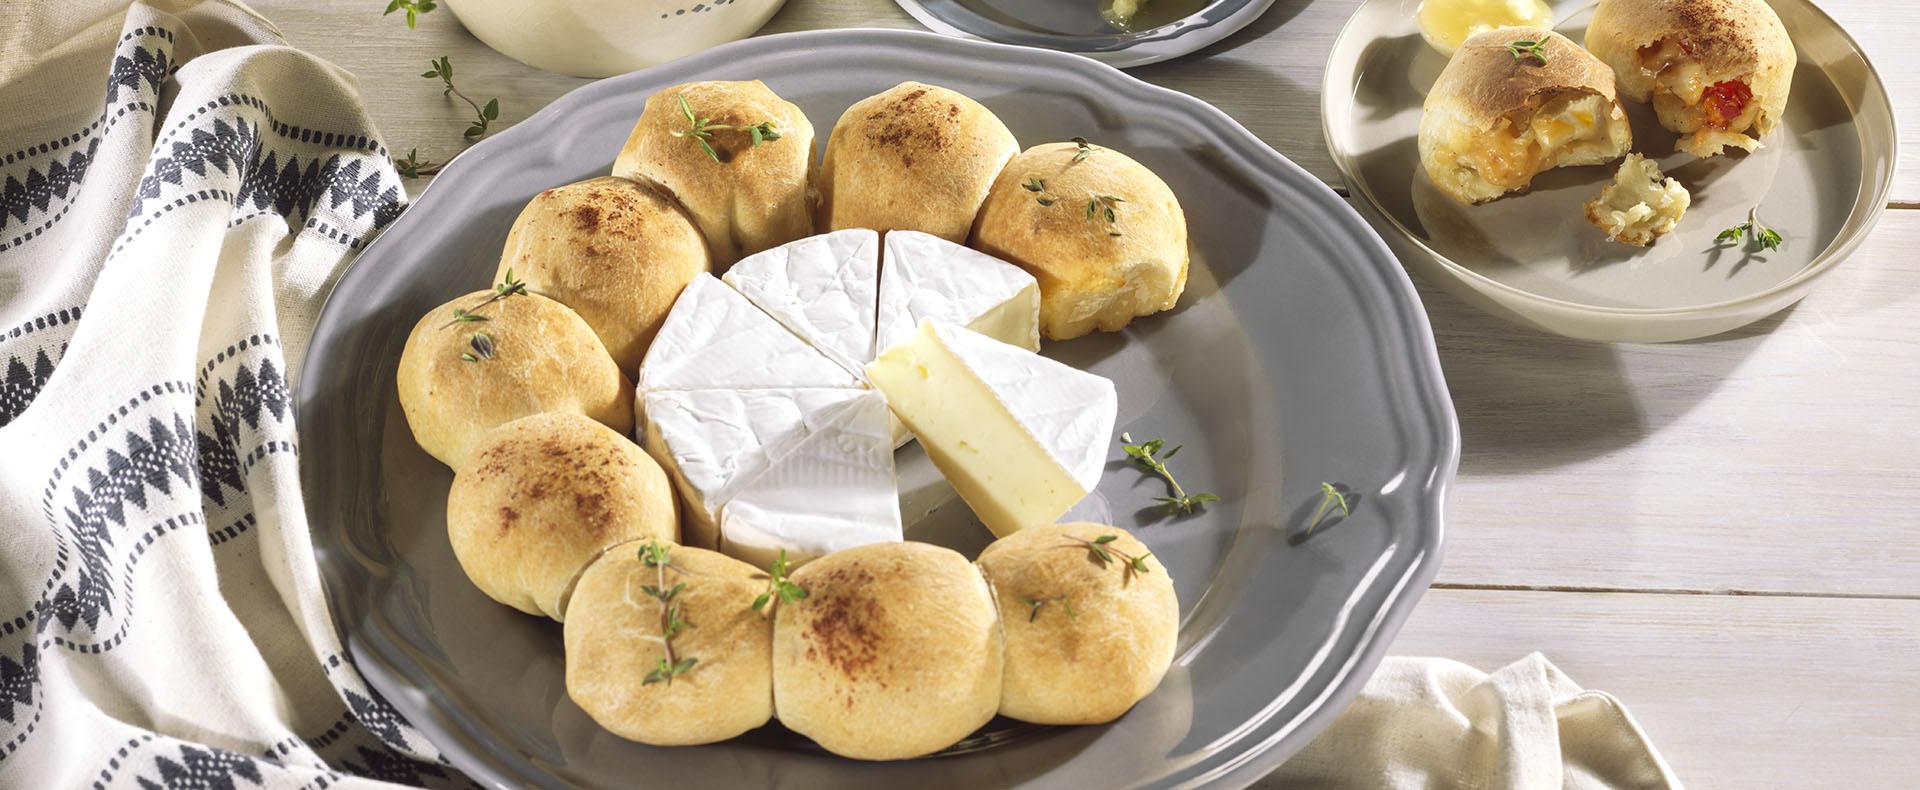 Pizzabällchen mit Camembert